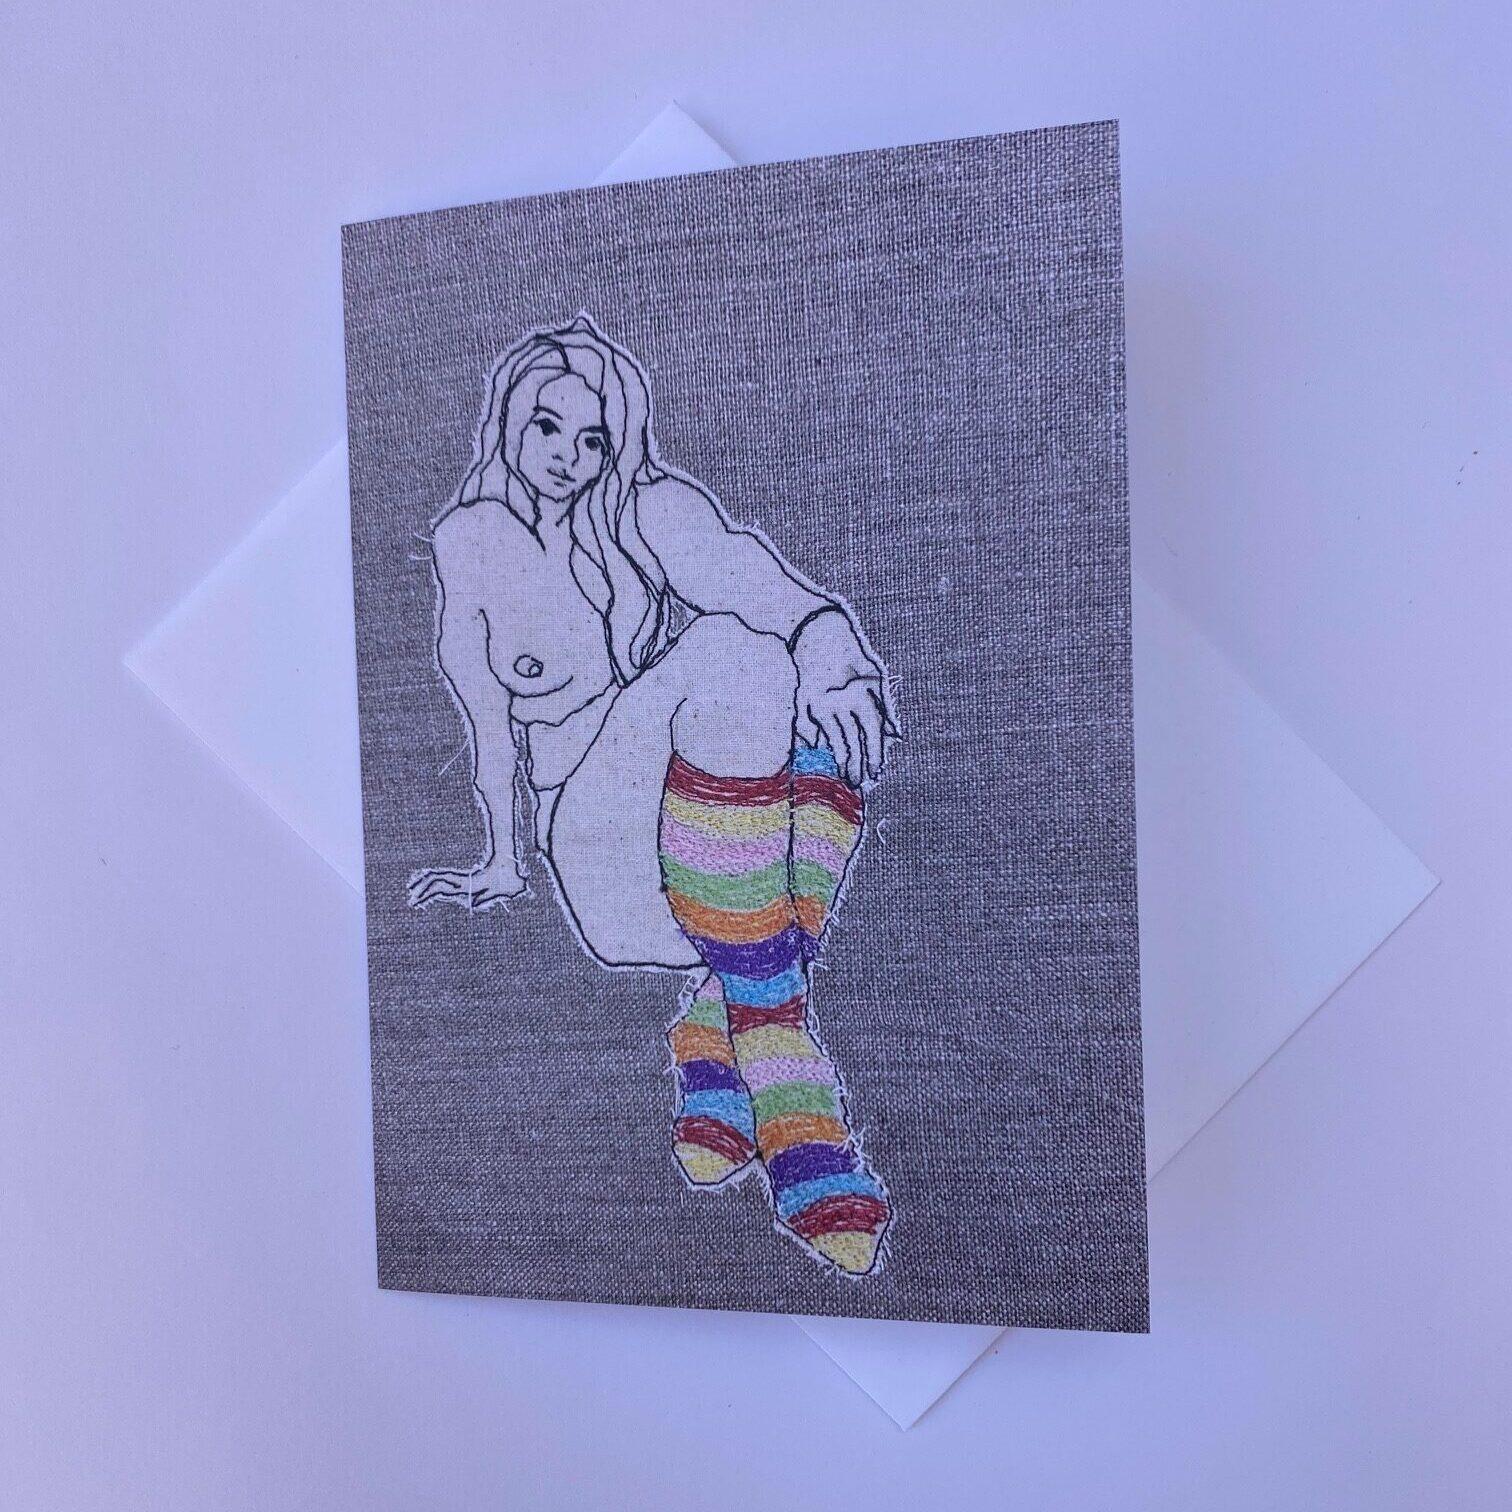 Ms Stripey Socks III Greeting Card By Juliet D Collins